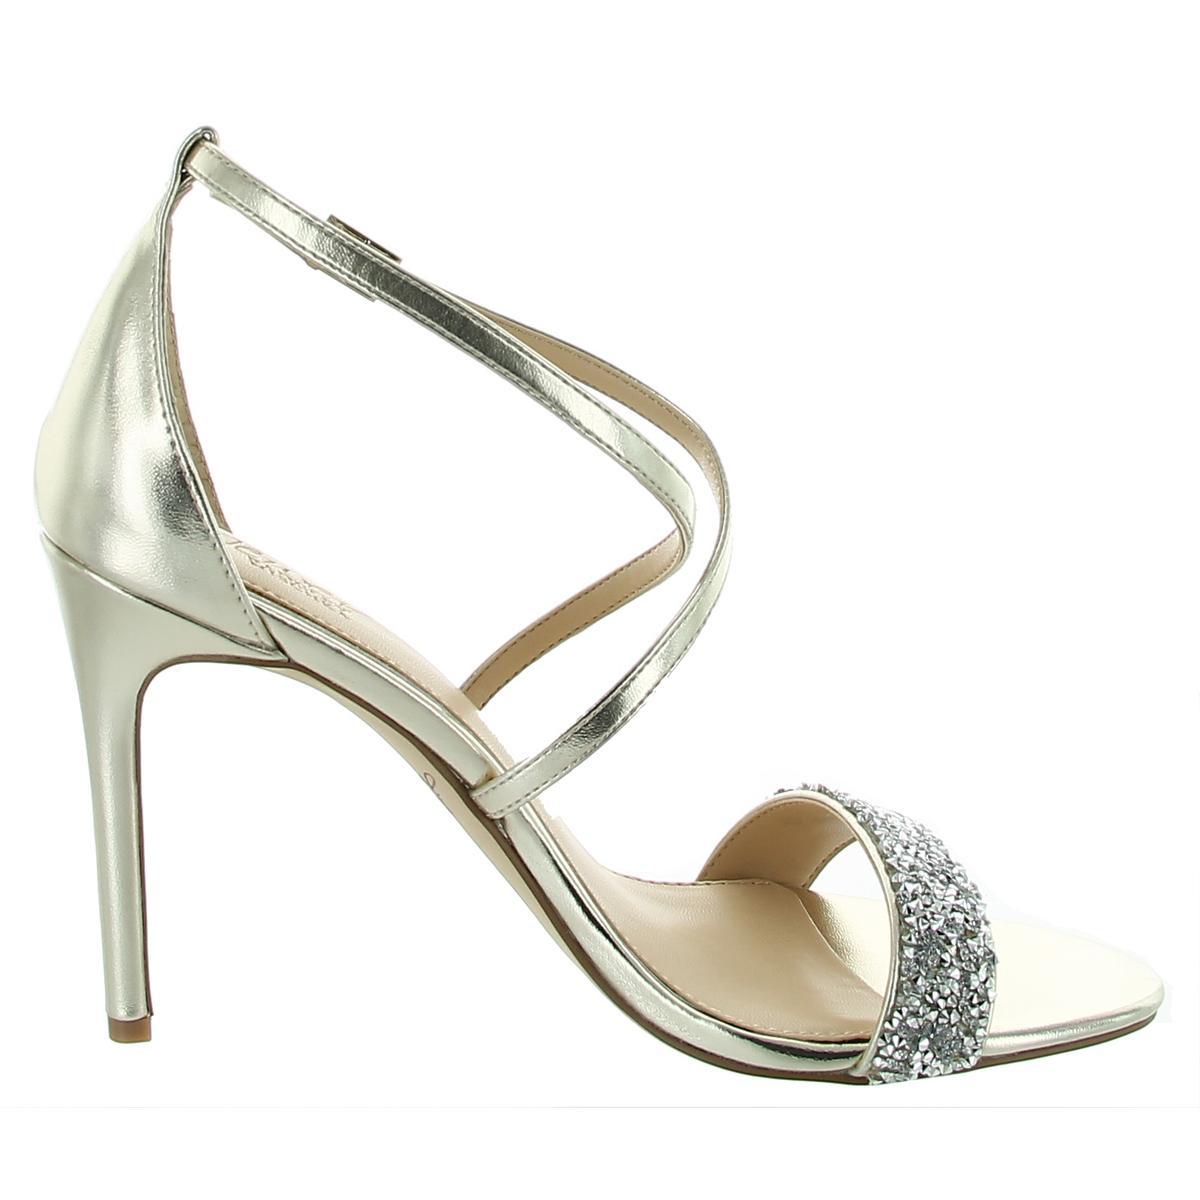 thumbnail 4 - Jewel Badgley Mischka Womens NANNA Ankle Strap Open Toe Pumps Shoes BHFO 1037